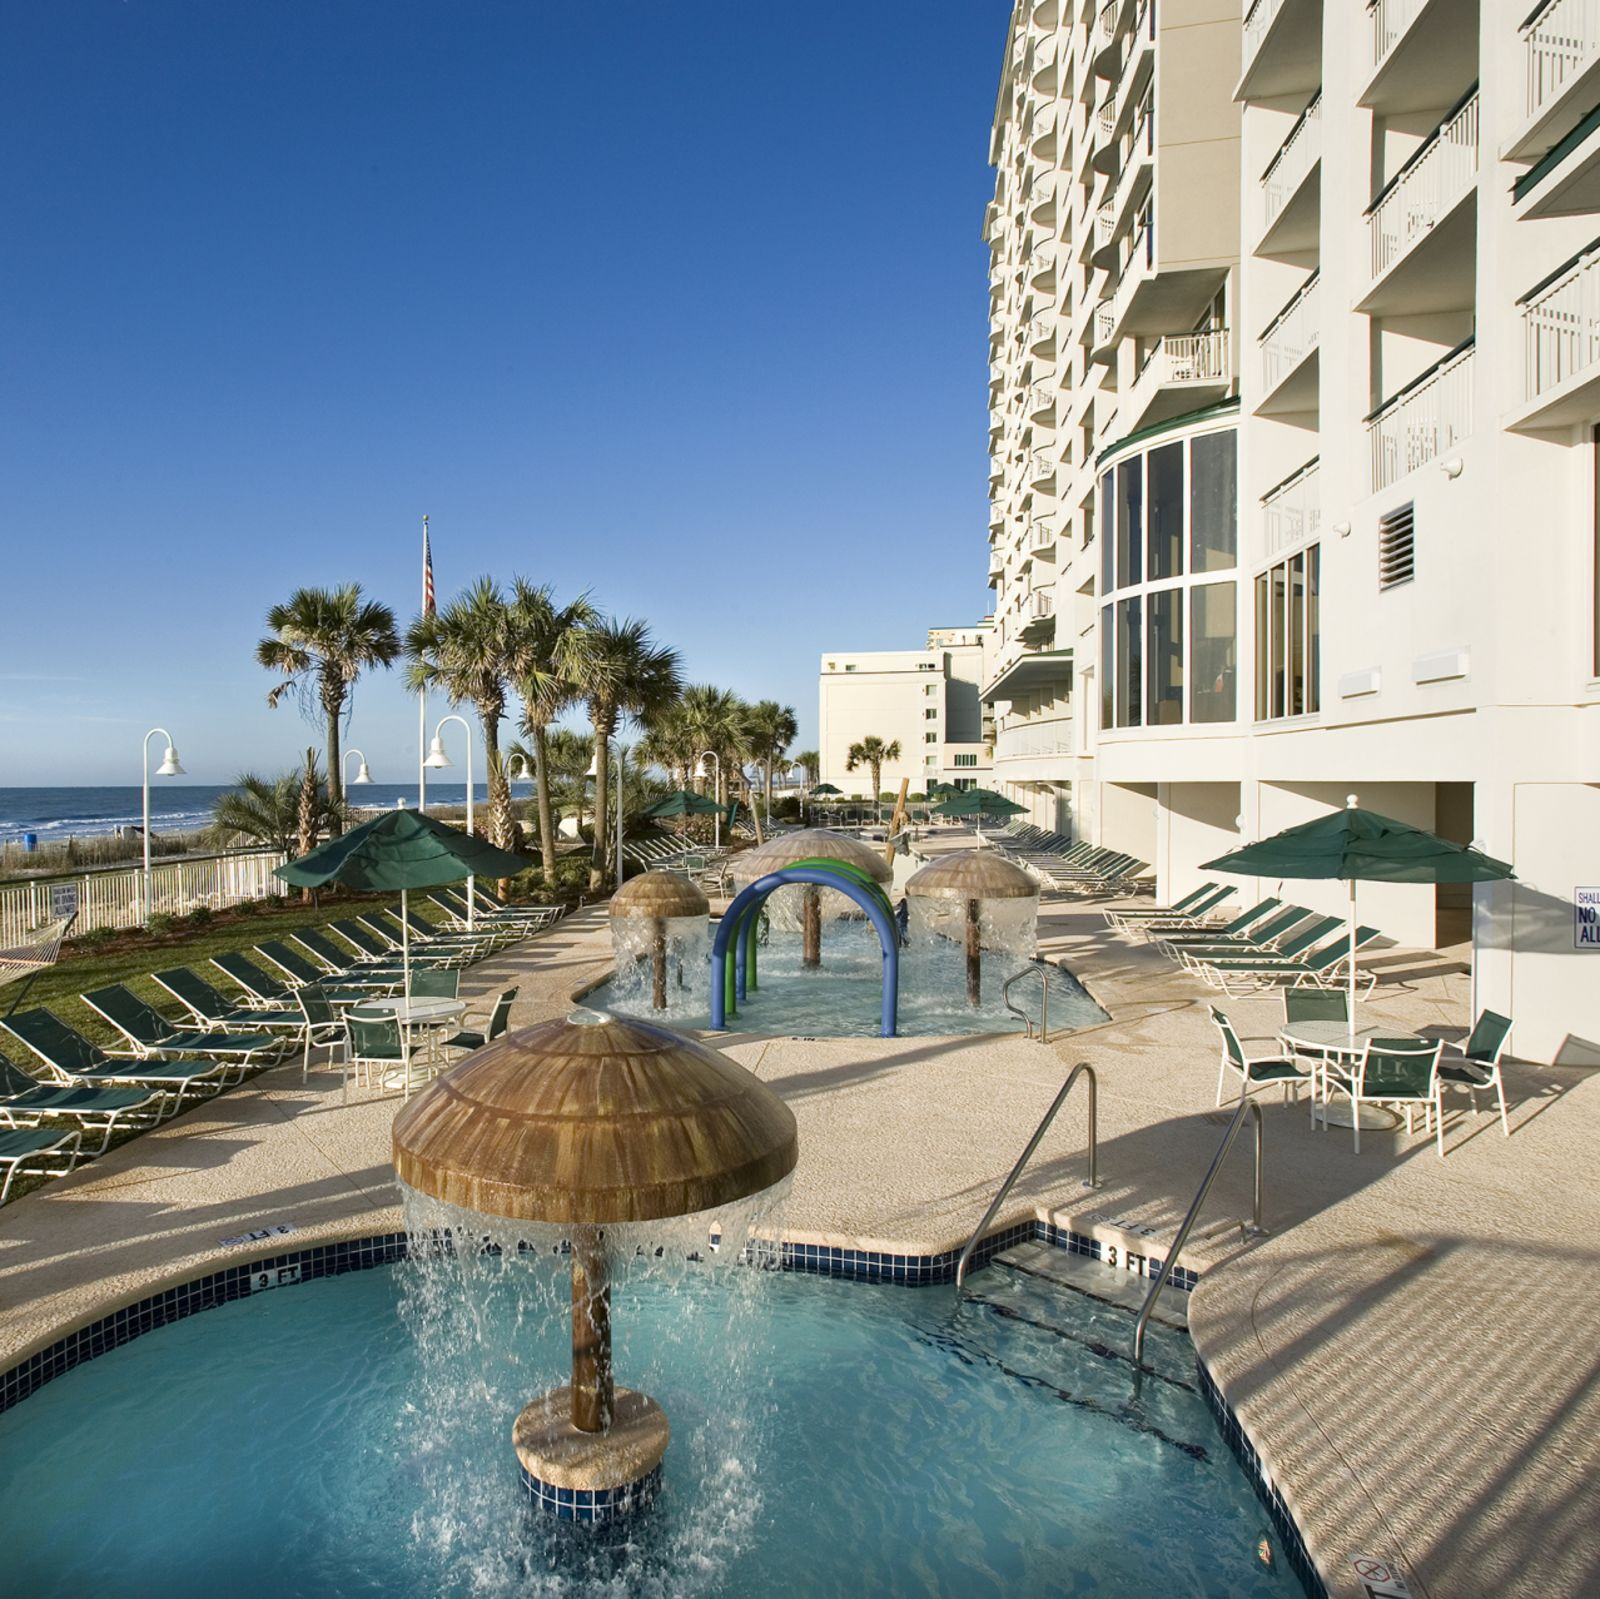 hotel south carolina hampton inn suites myrtle beach. Black Bedroom Furniture Sets. Home Design Ideas